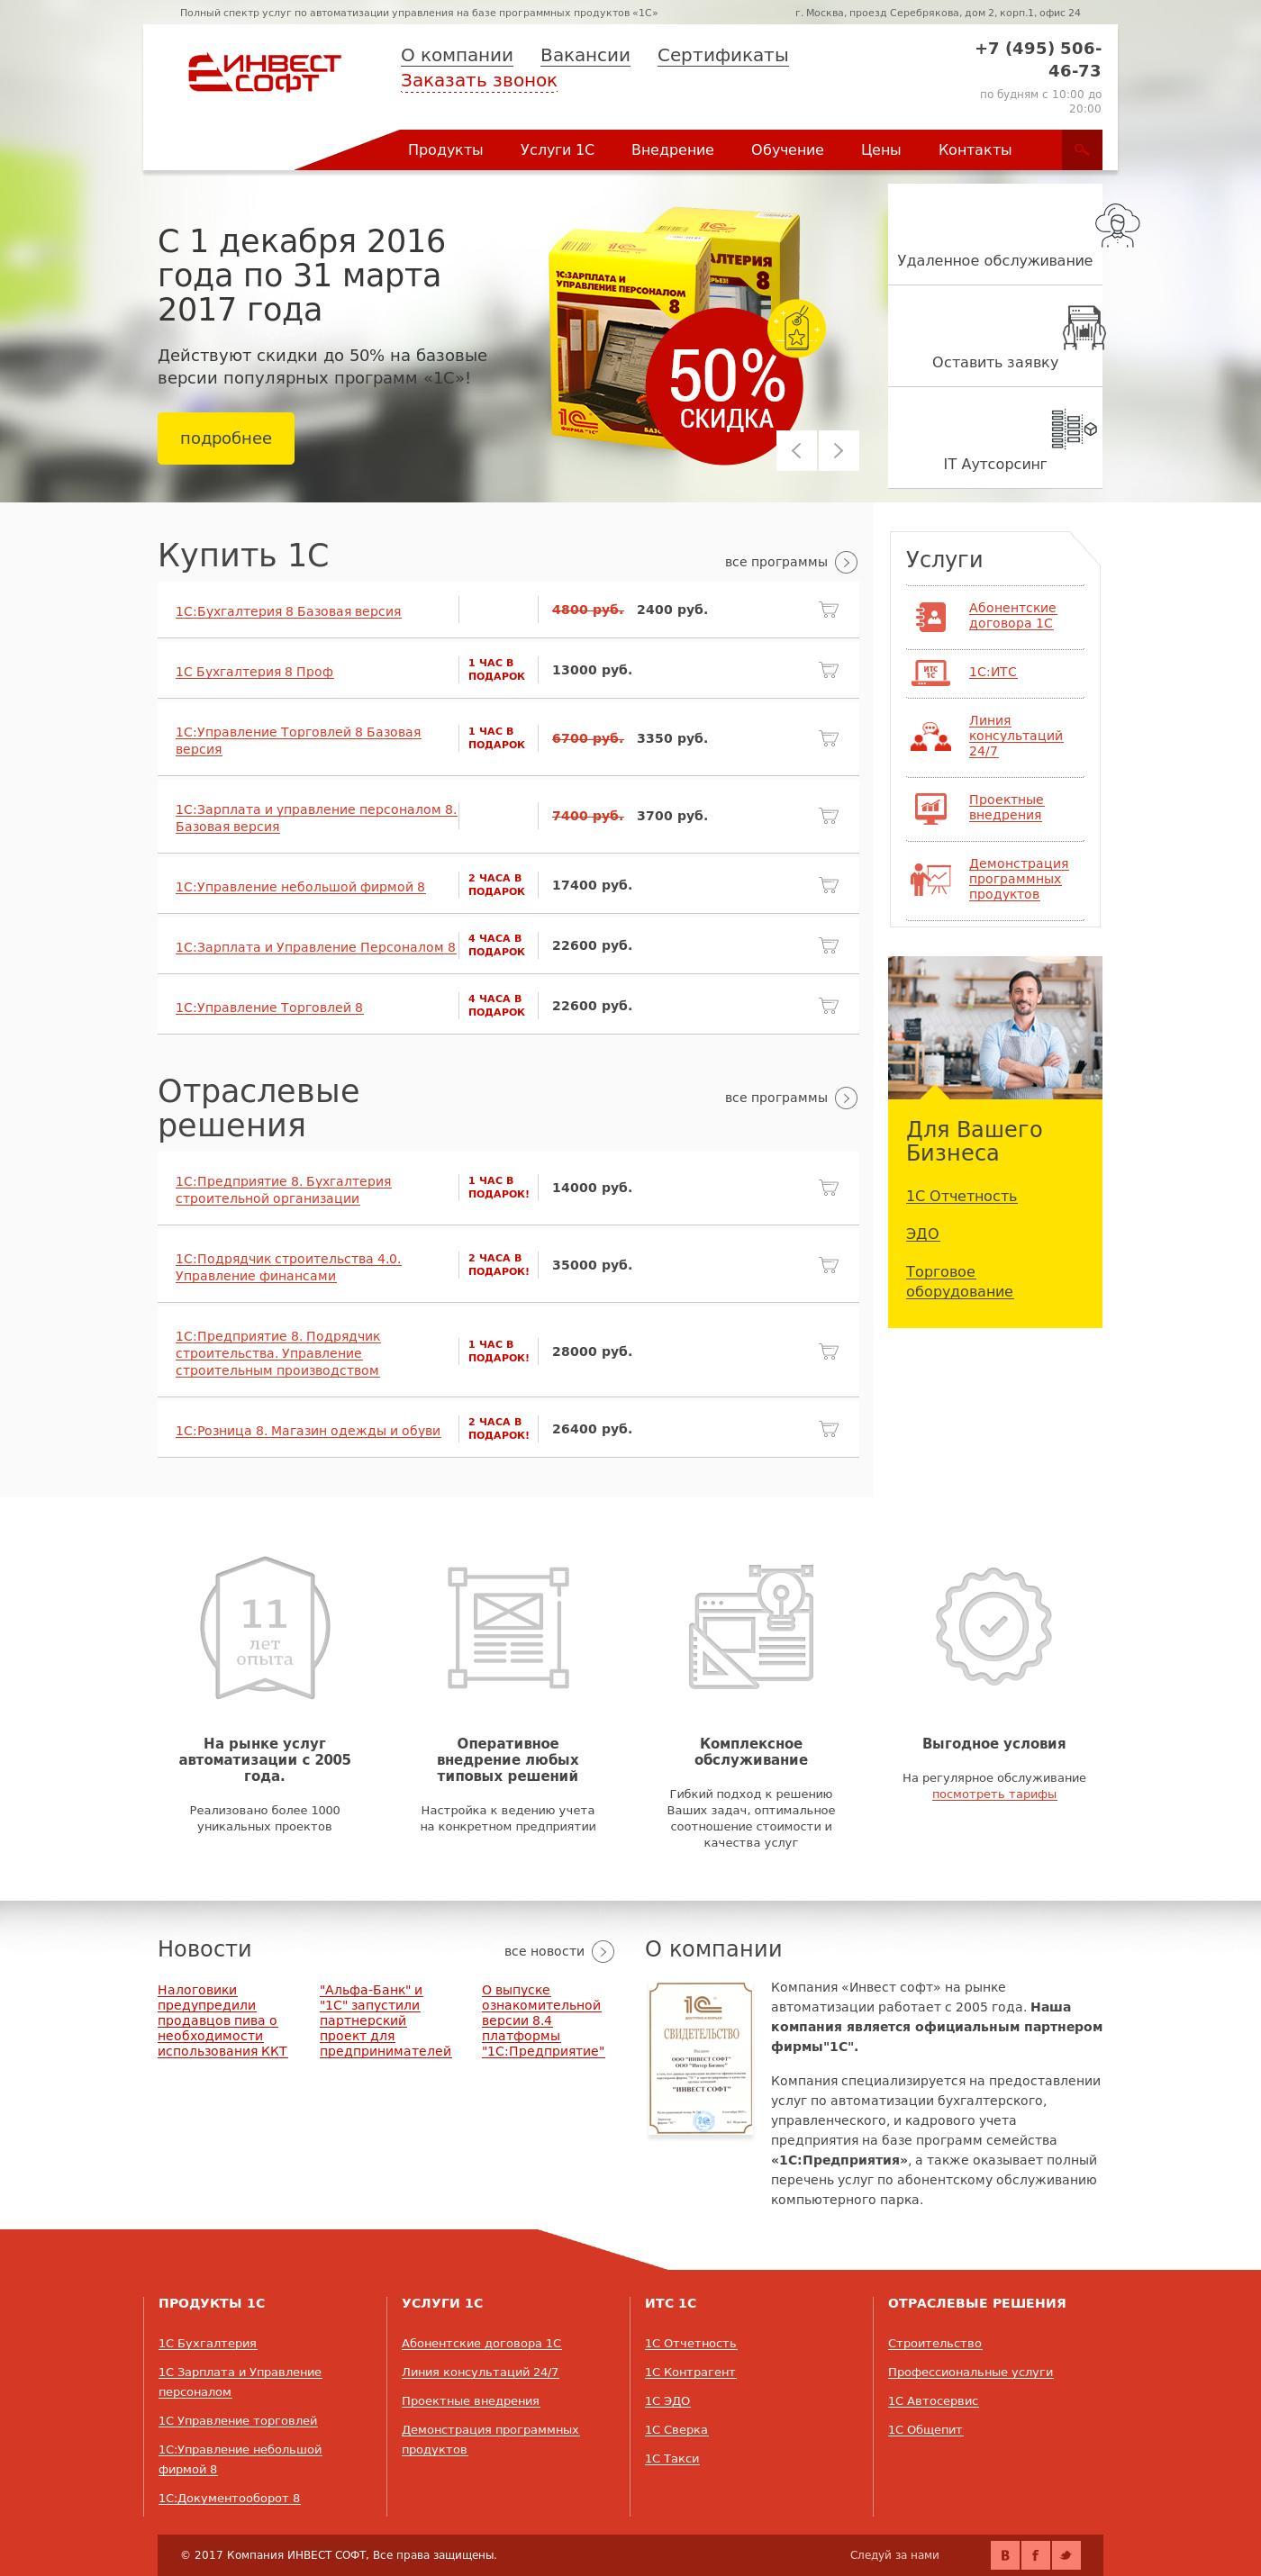 InvestSoft - сайт-каталог программного обеспечения.